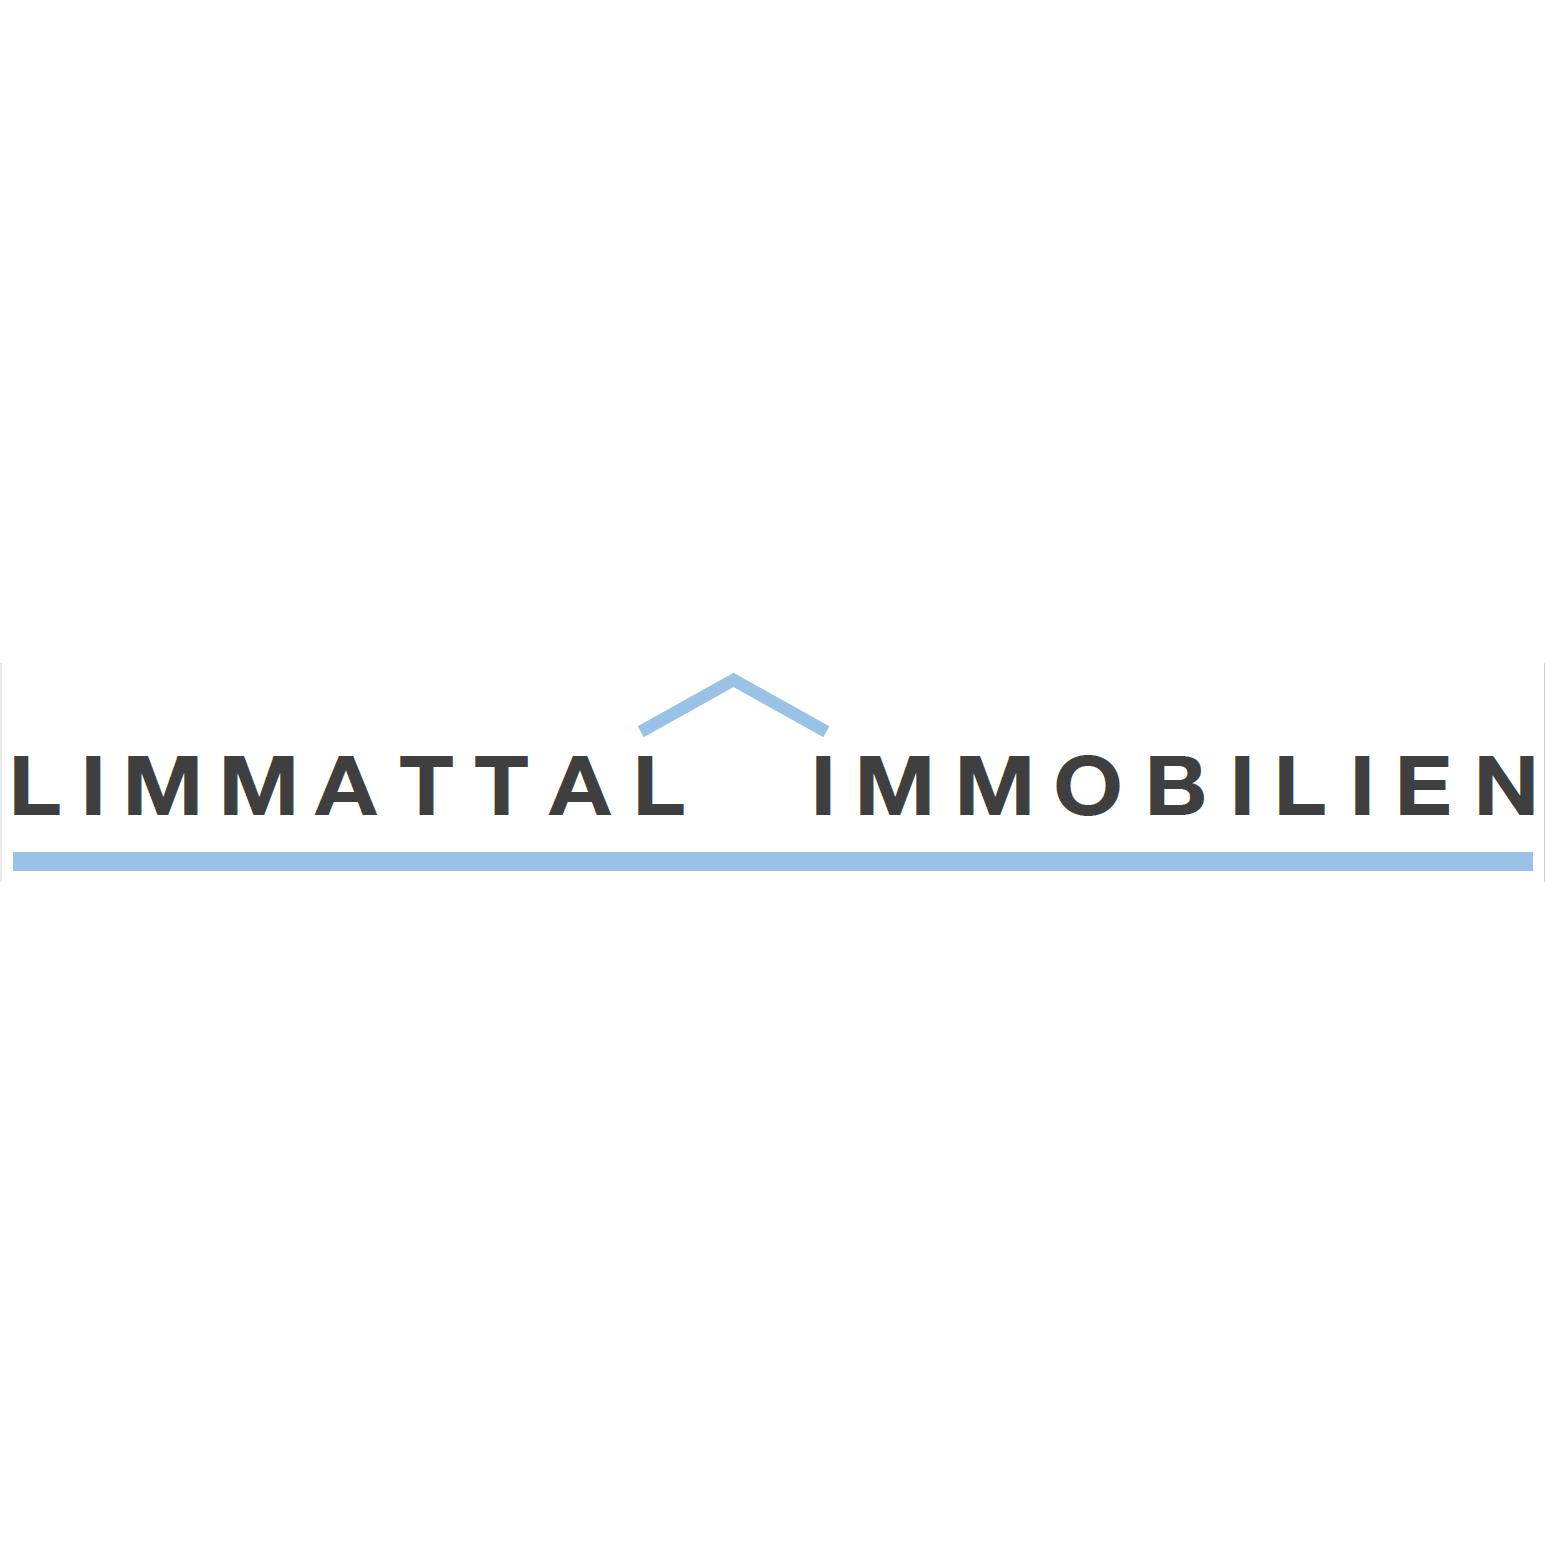 LIMMATTAL IMMOBILIEN GmbH